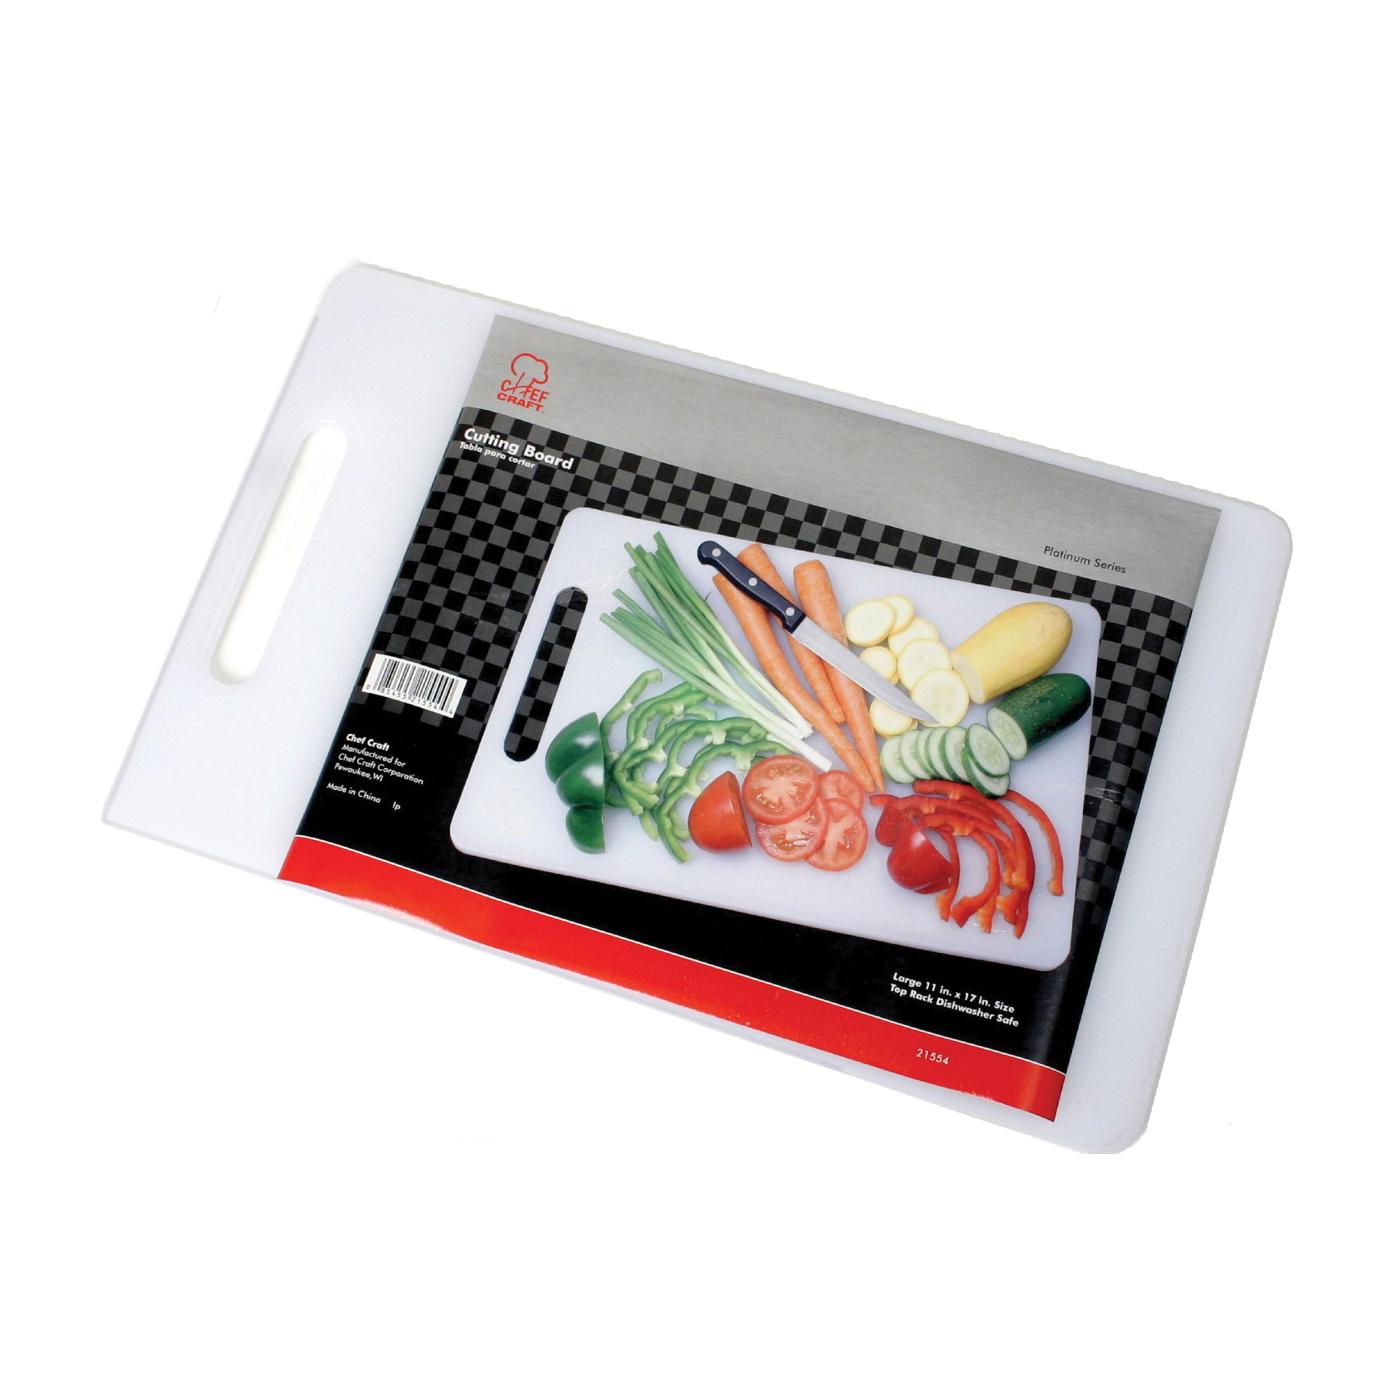 Picture of CHEF CRAFT 21554 Cutting Board, 17-1/2 in L, 11 in W, Plastic, White